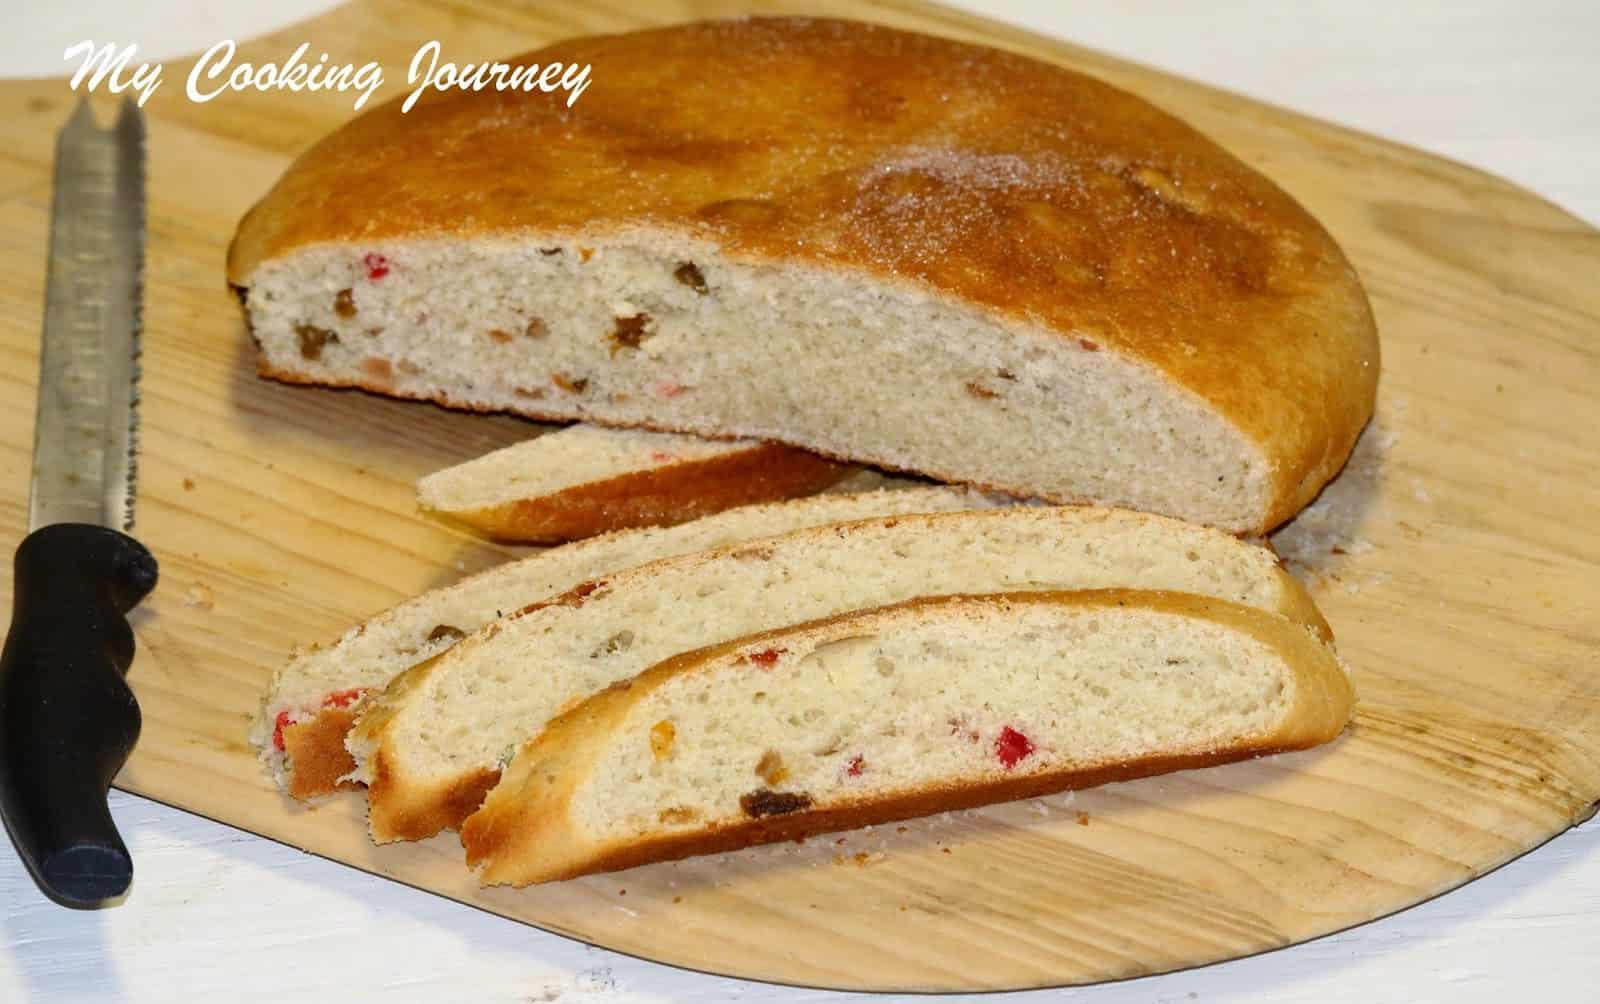 Julekake Norwegian Christmas Bread Recipe  Julekake or Julekaga – Norwegian Christmas Bread Egg Less